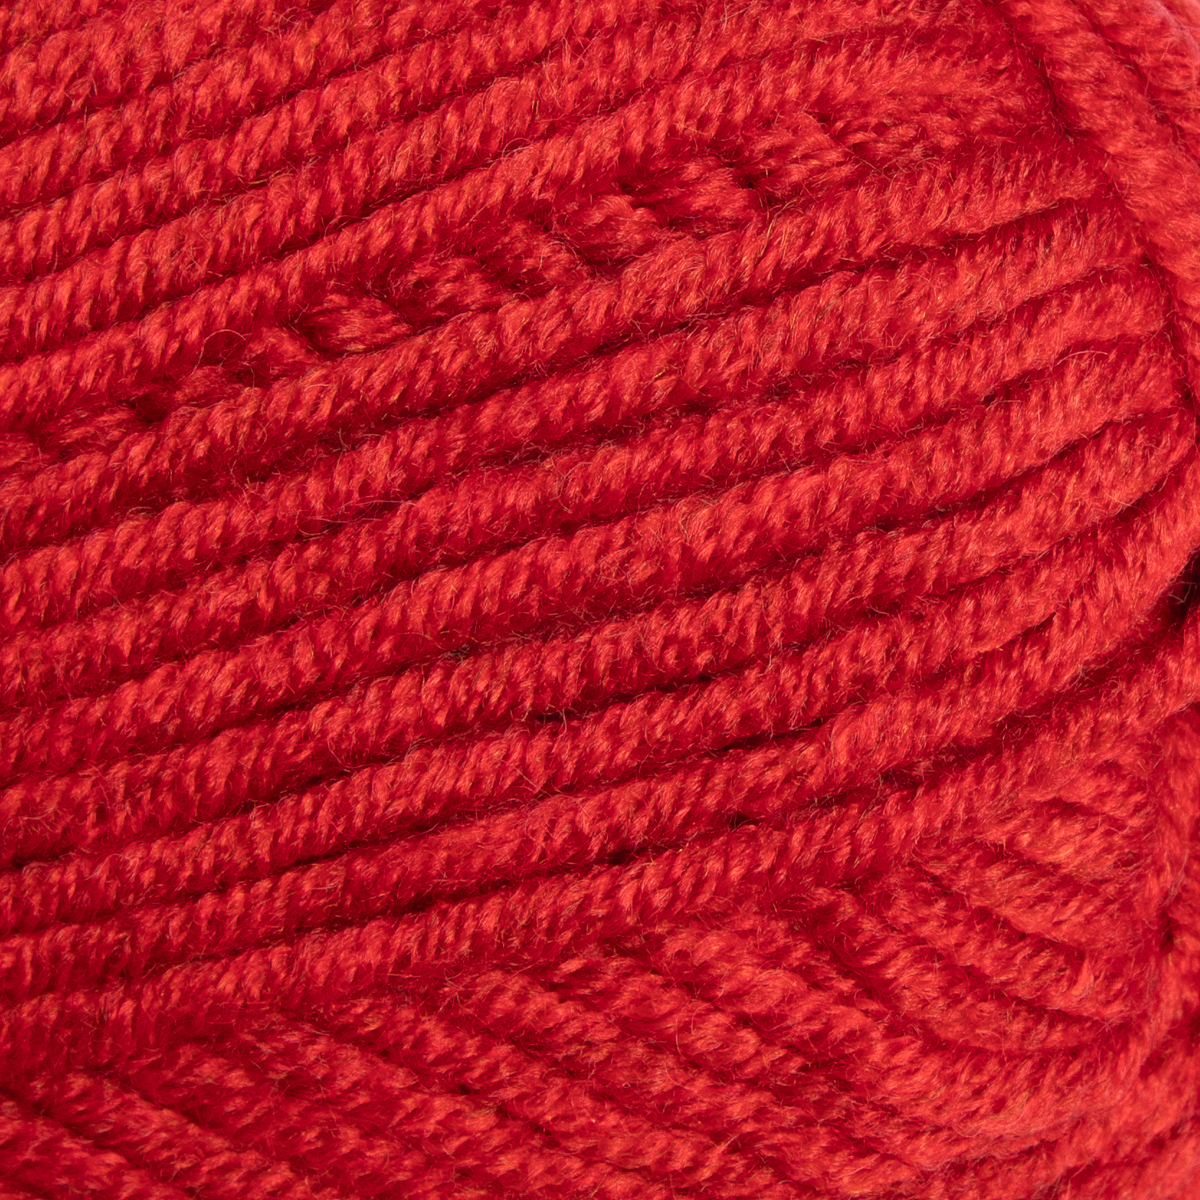 3pk-Lion-Brand-Woolspun-Acrylic-amp-Wool-Yarn-Bulky-5-Knit-Crocheting-Skeins-Soft thumbnail 107